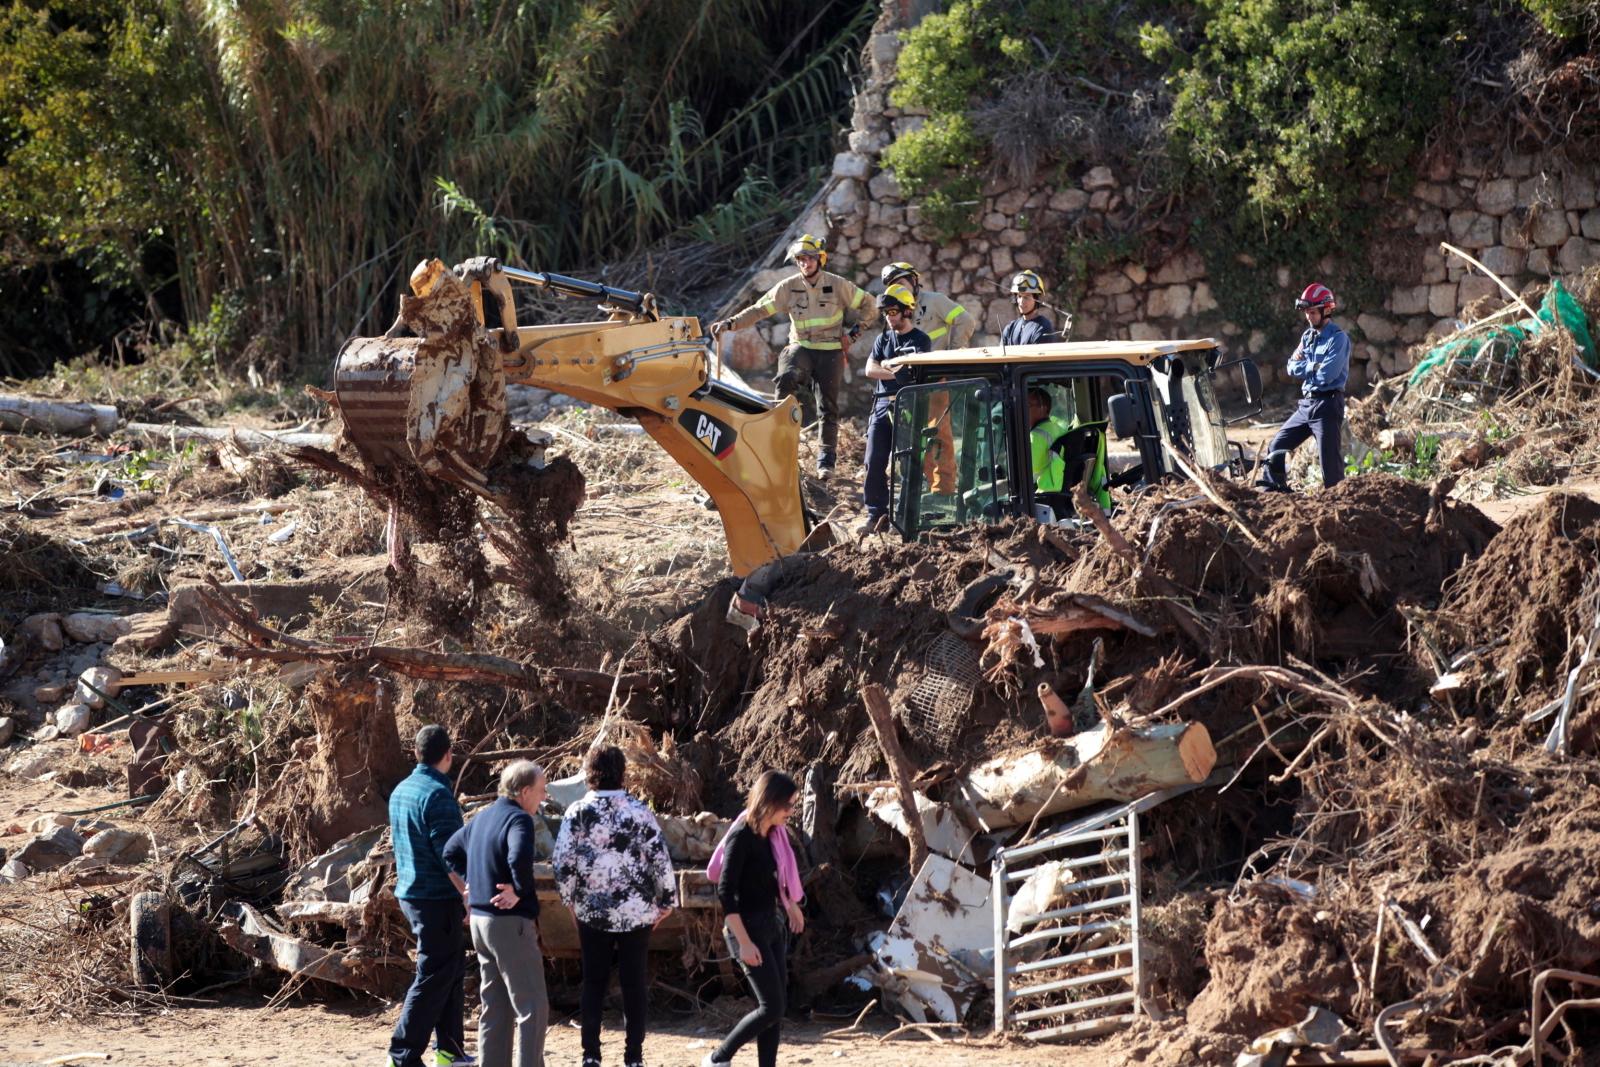 Poszukiwania ludzi po katastrofie fot. EPA/JAUME SELLART